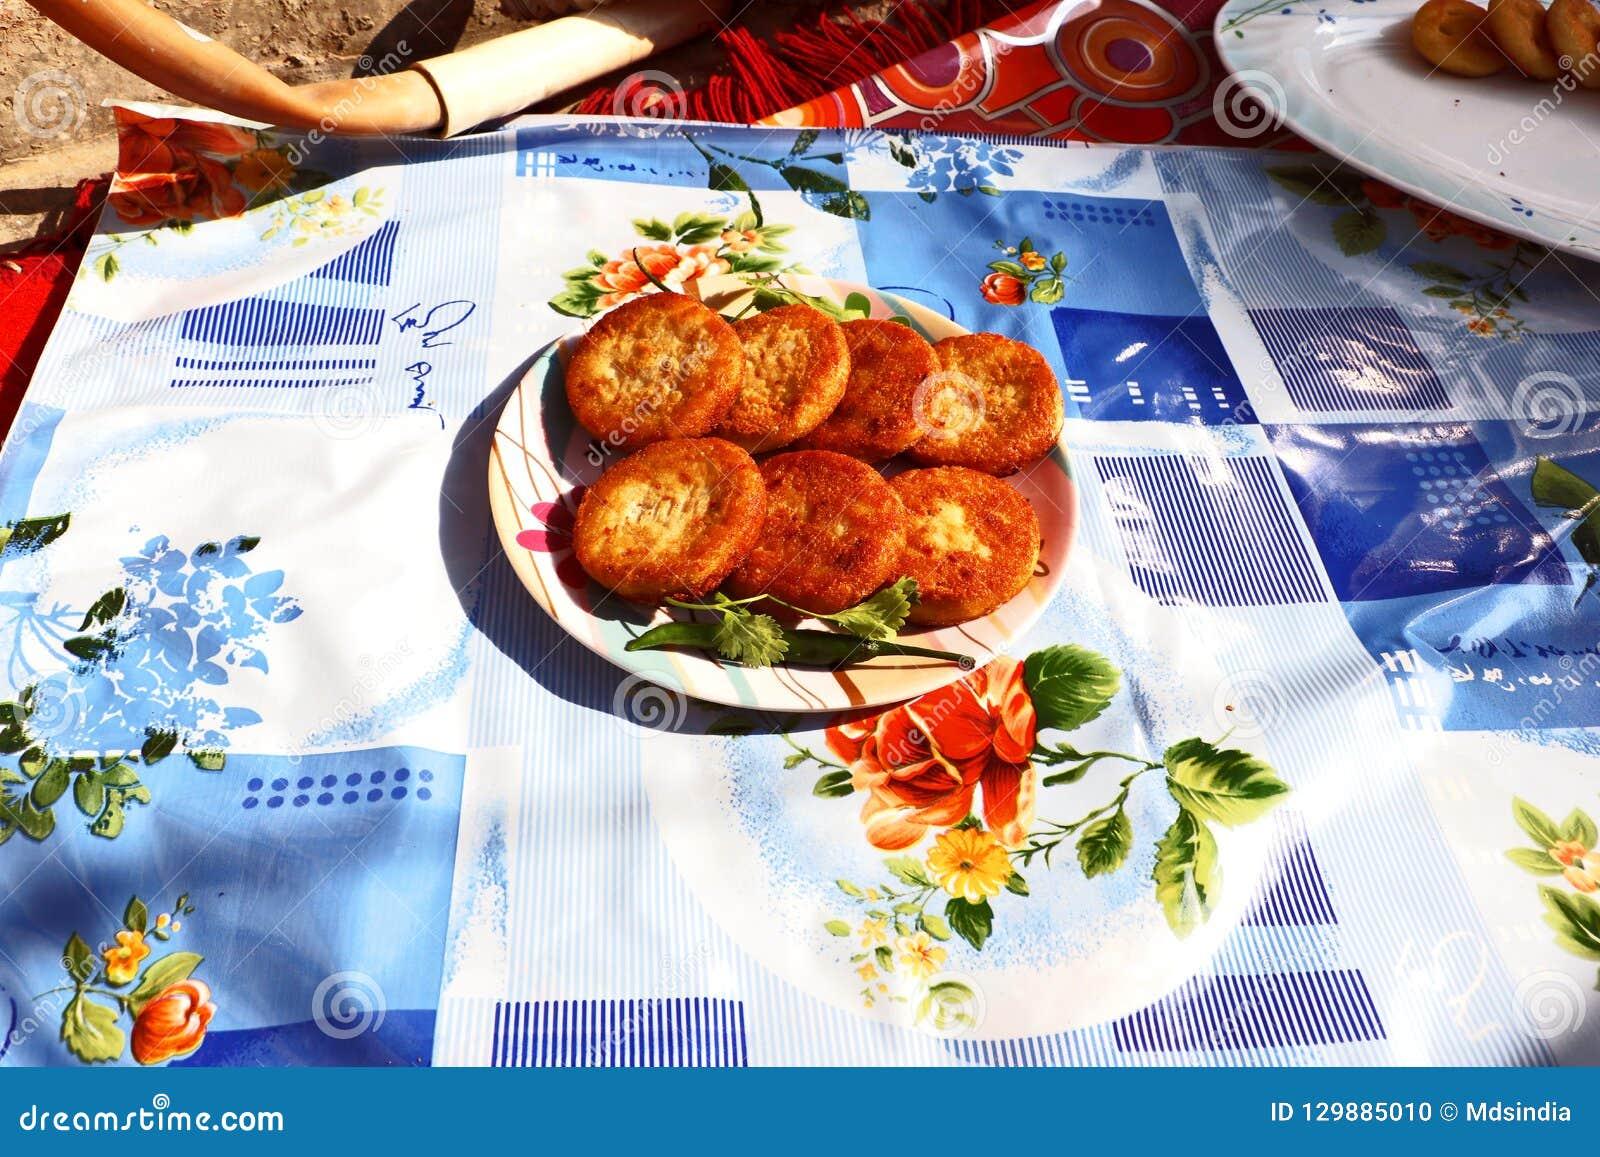 Aloo Tikki of Fried Potato Patties